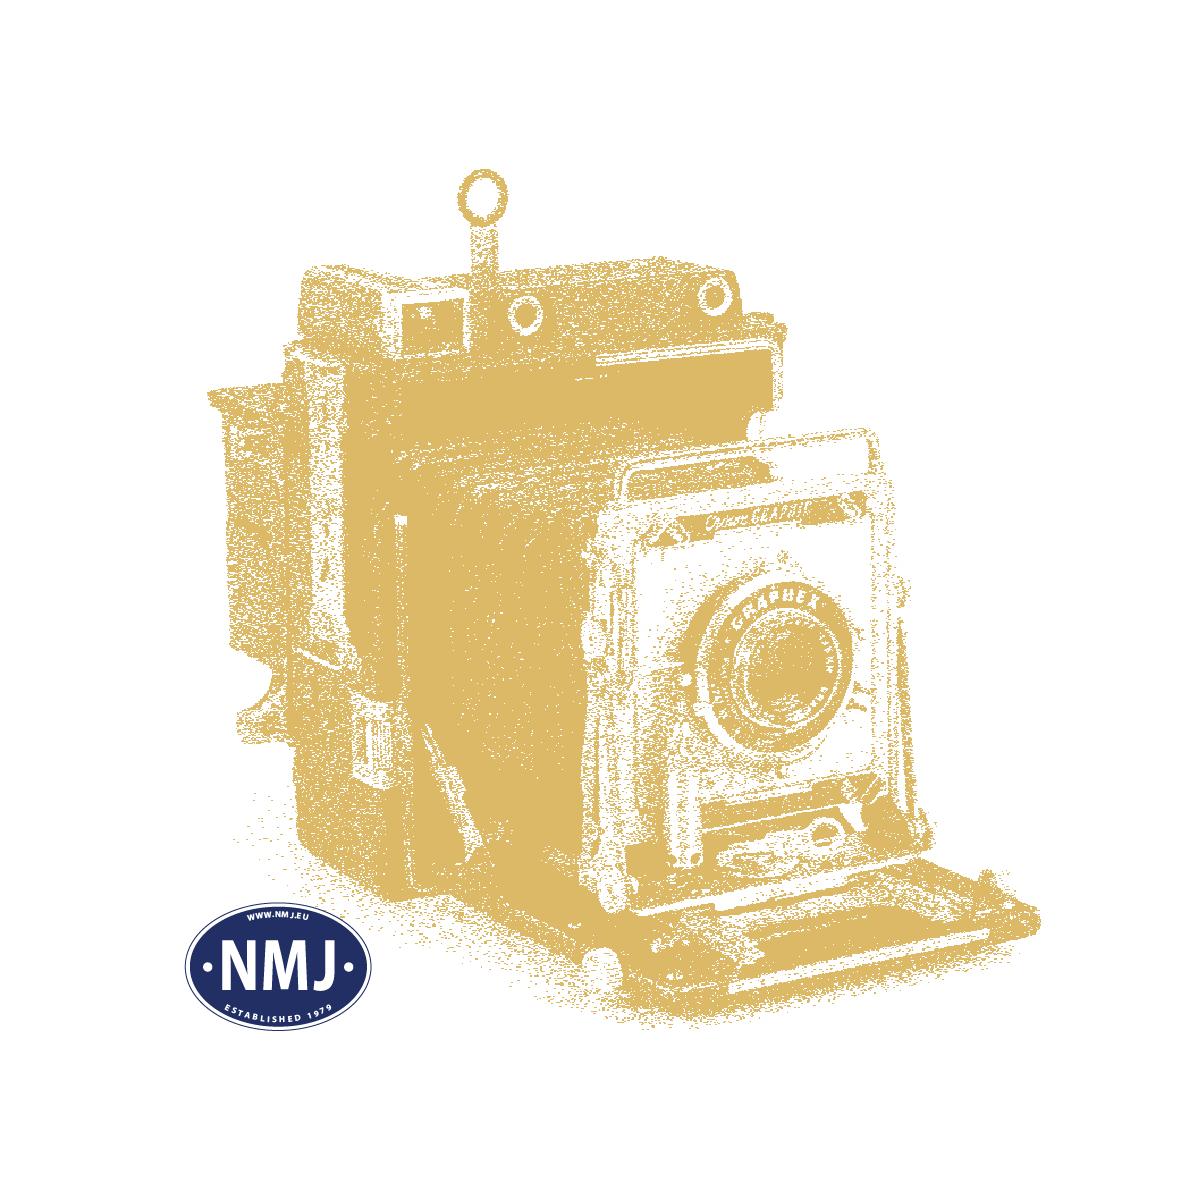 NMJT506.301 - NMJ Topline NSB Gbs 150 0 200-3